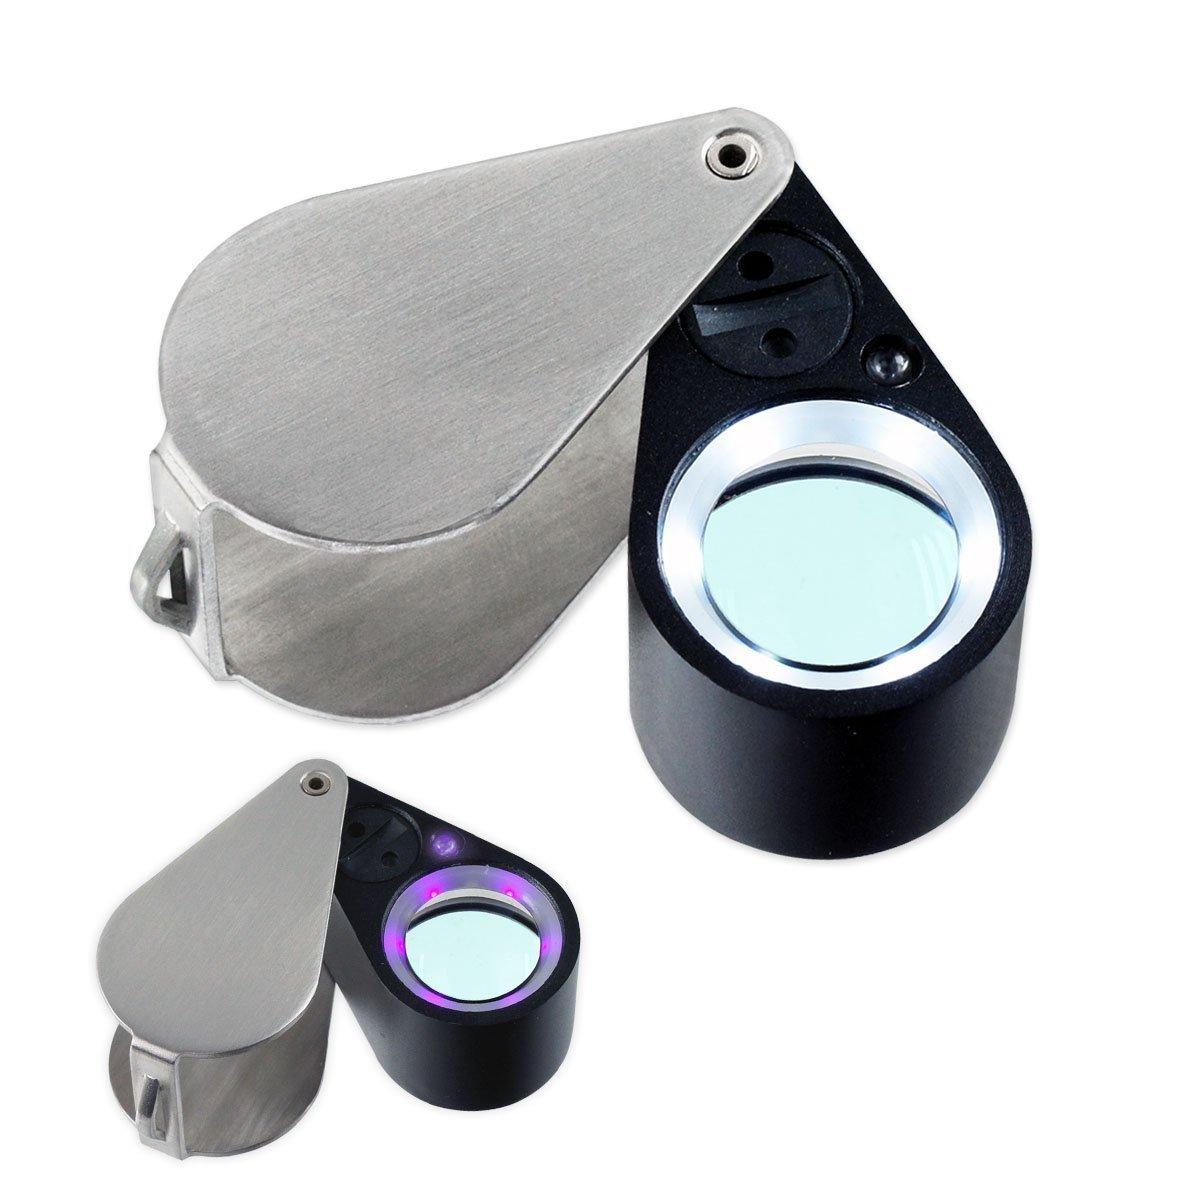 10x21mm Uv/led Triplet Illuminated Loupe-dual Light (White & Uv) Magnifier Loupe Ade Advanced Optics®